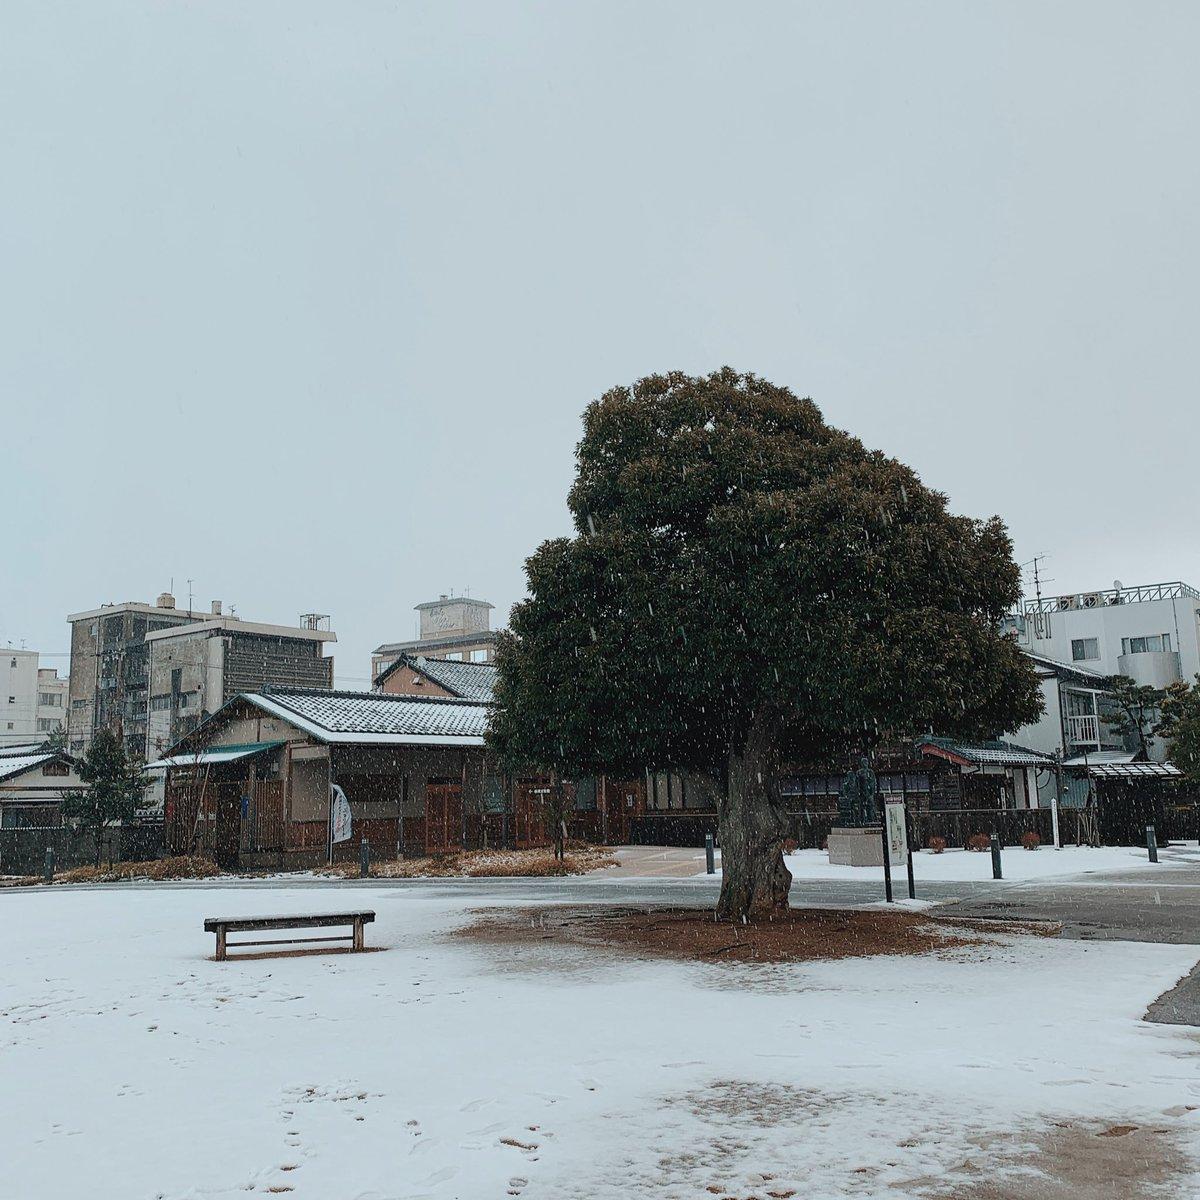 Random shots of #Japan. Taken using my iPhone XR & enhanced with #VSCO app 🇯🇵